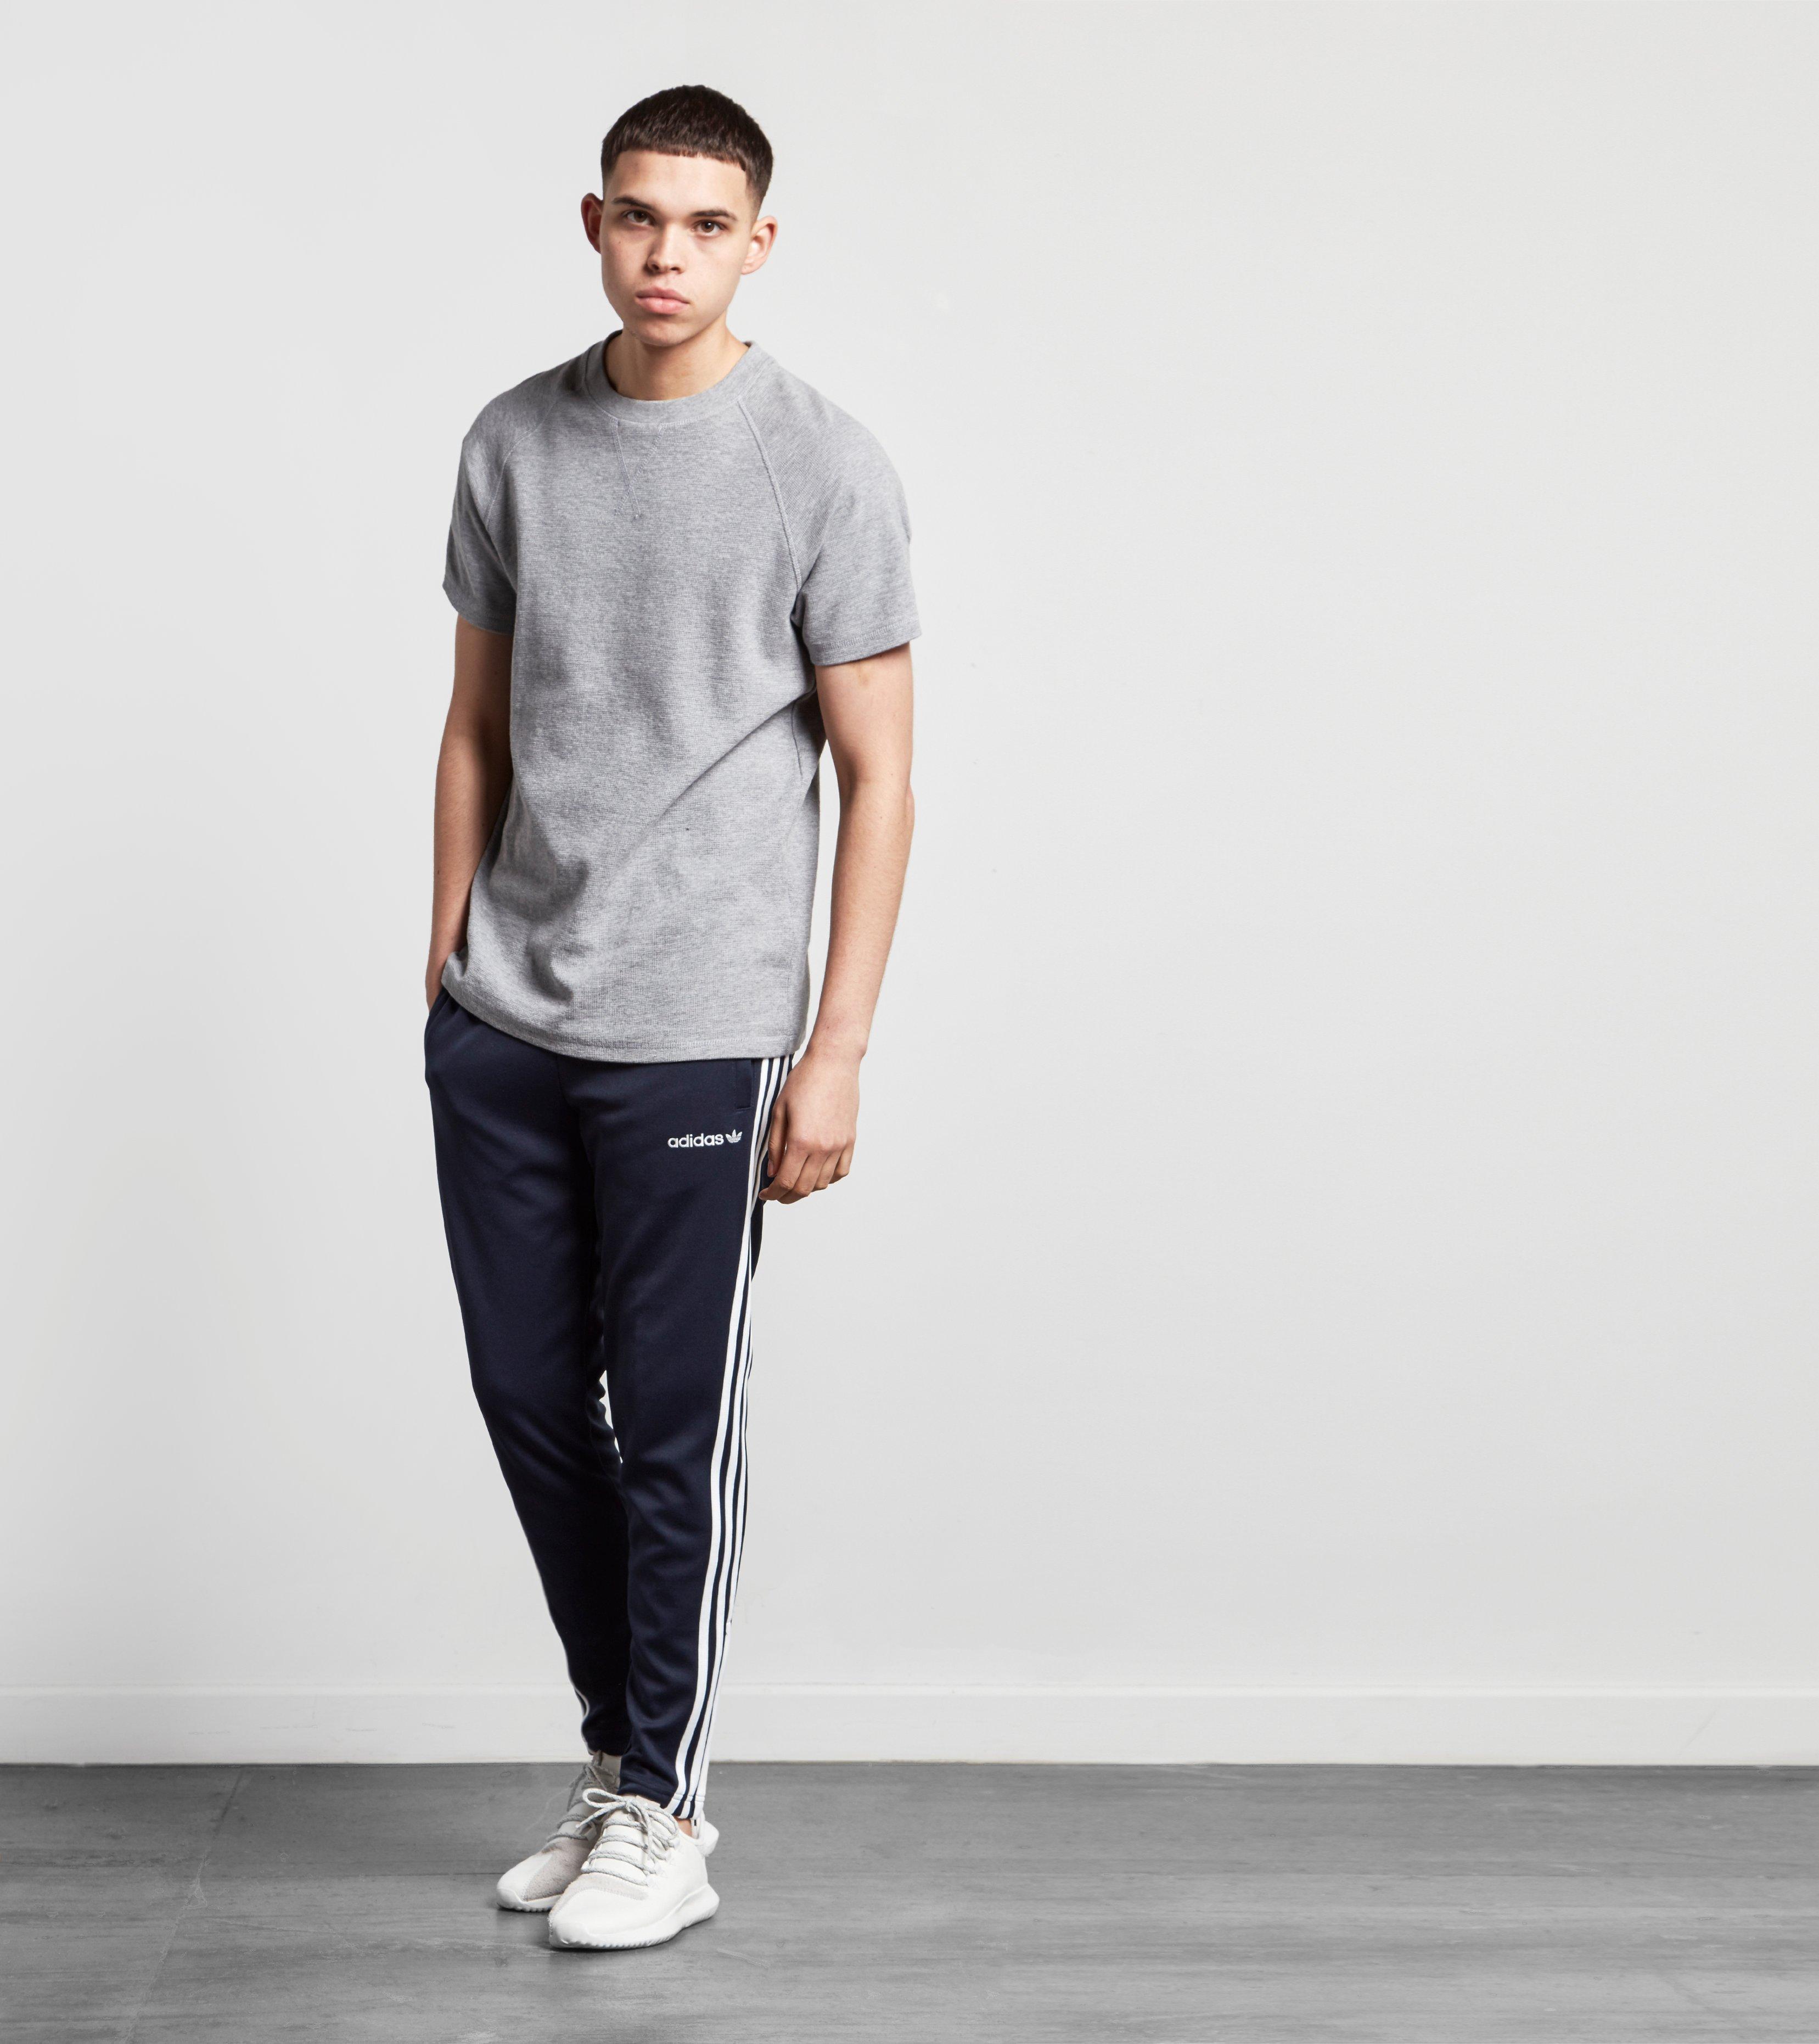 Lyst - Adidas originals Itasca Track Pants in Blue for Men